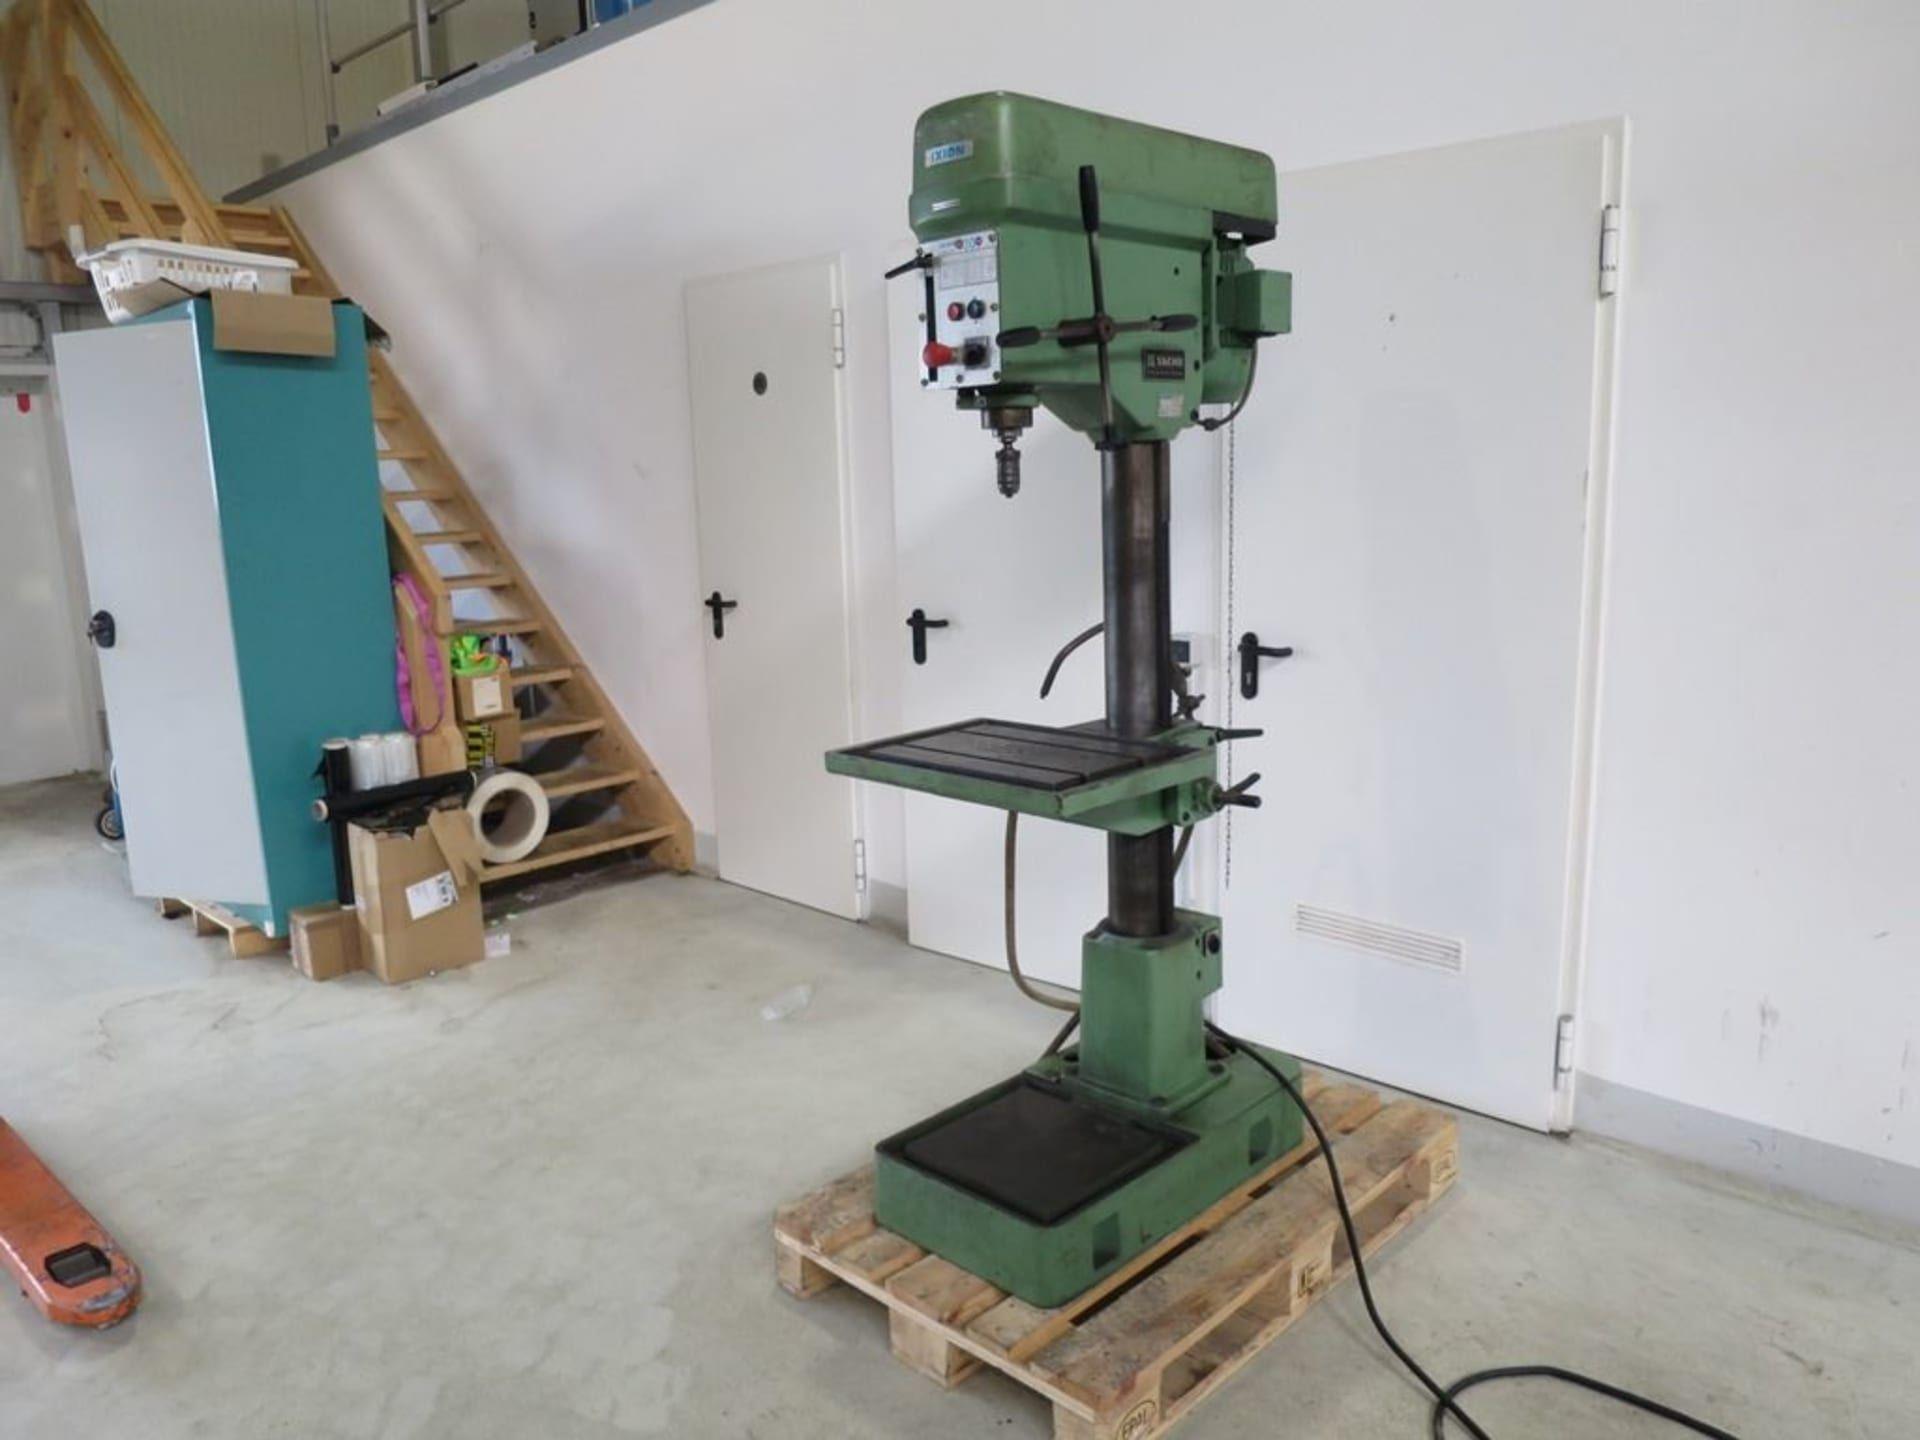 IXION BS 30 ST Säulenbohrmaschine